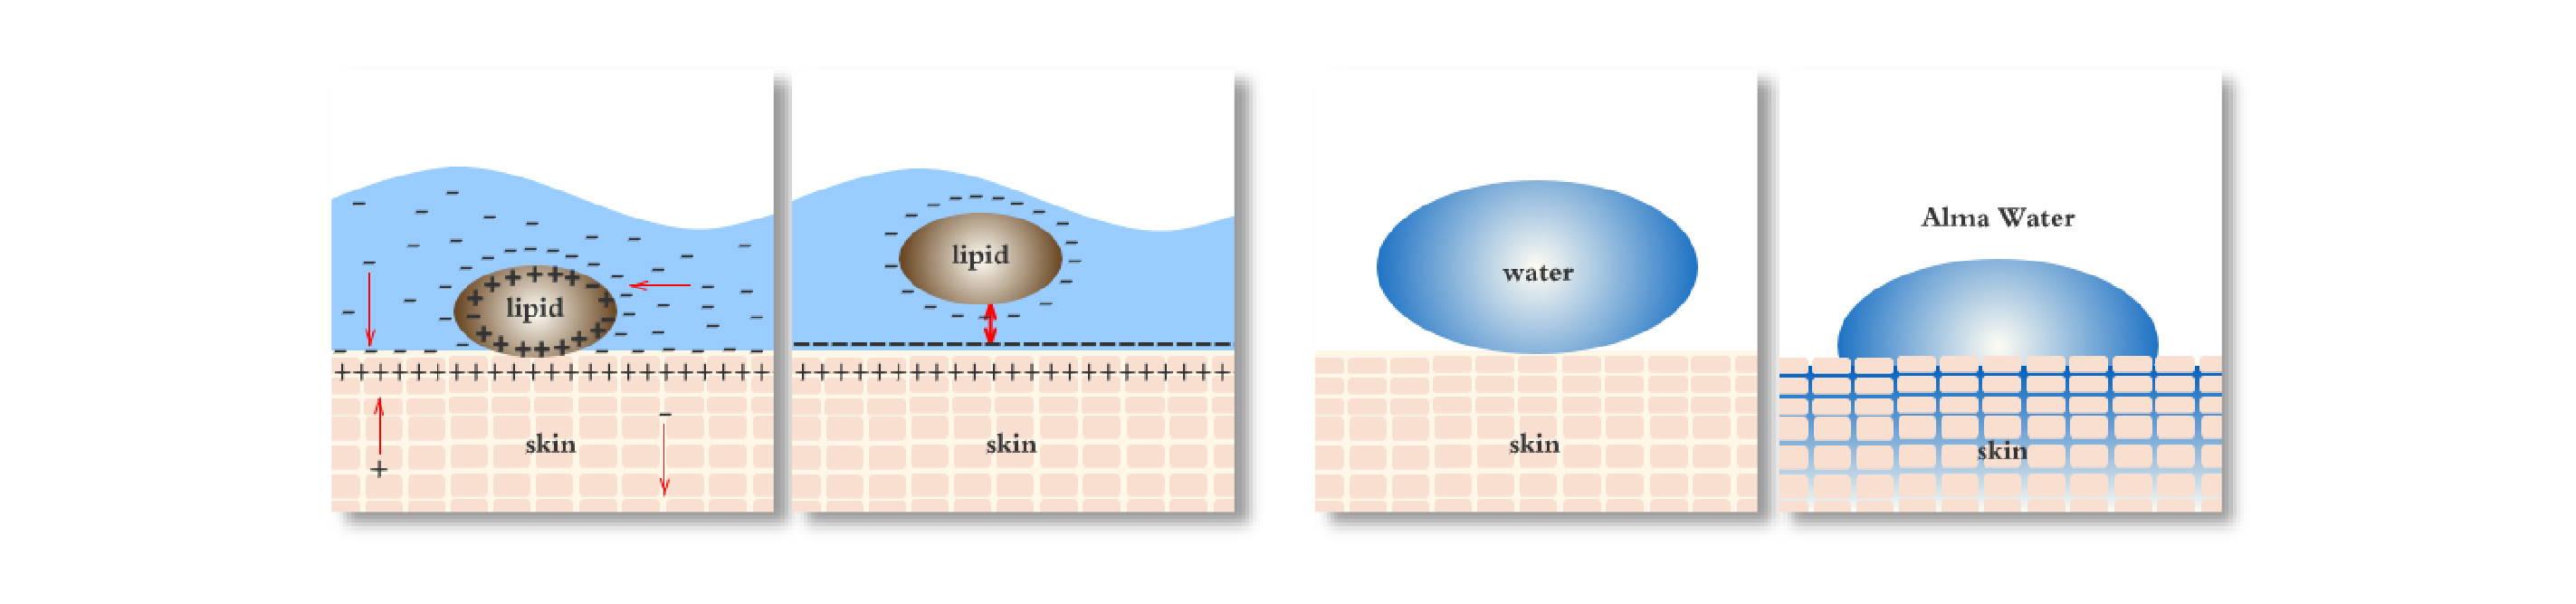 Alma Water effect on skin illustration